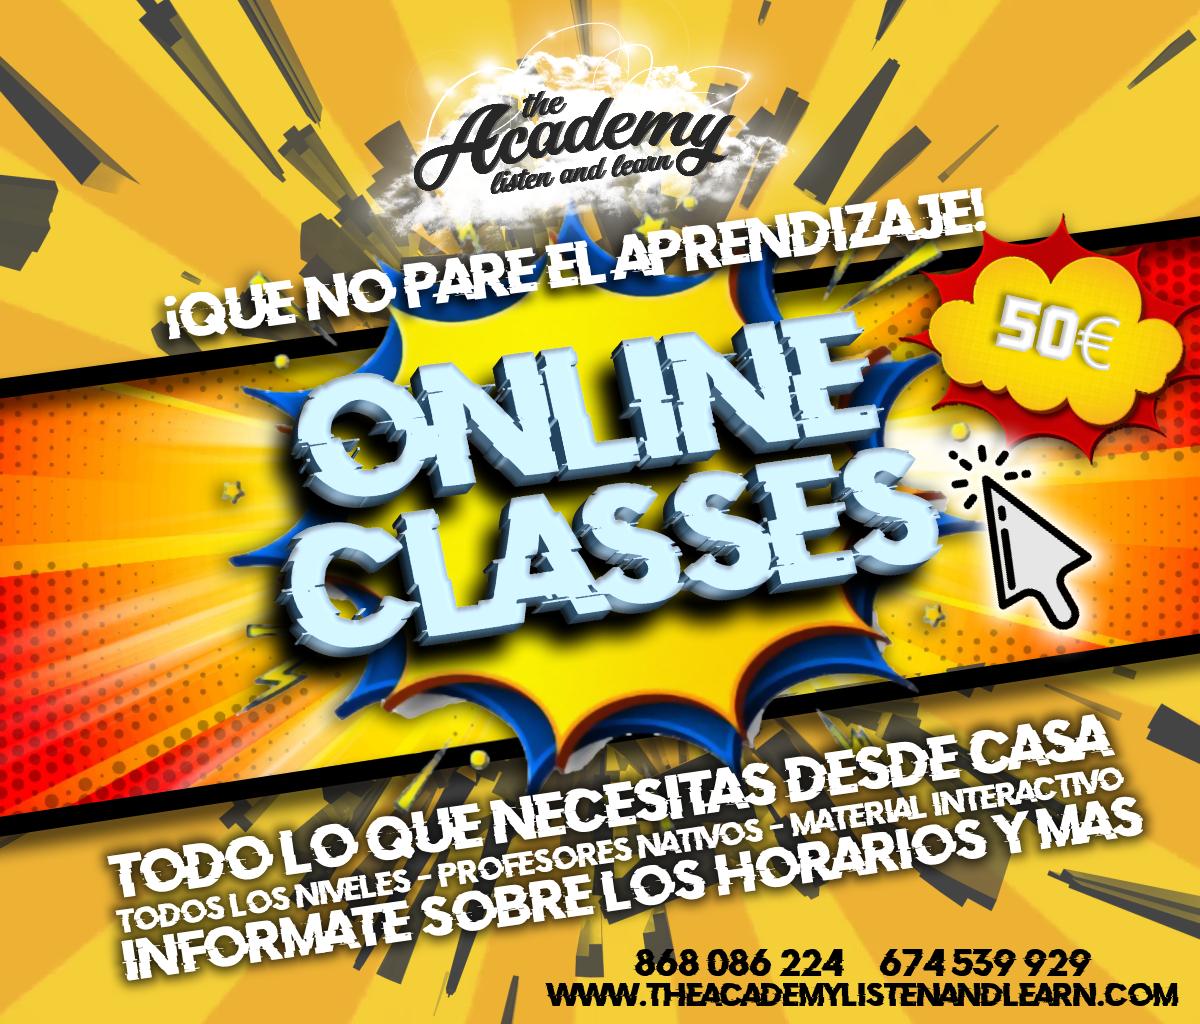 Online classes ad